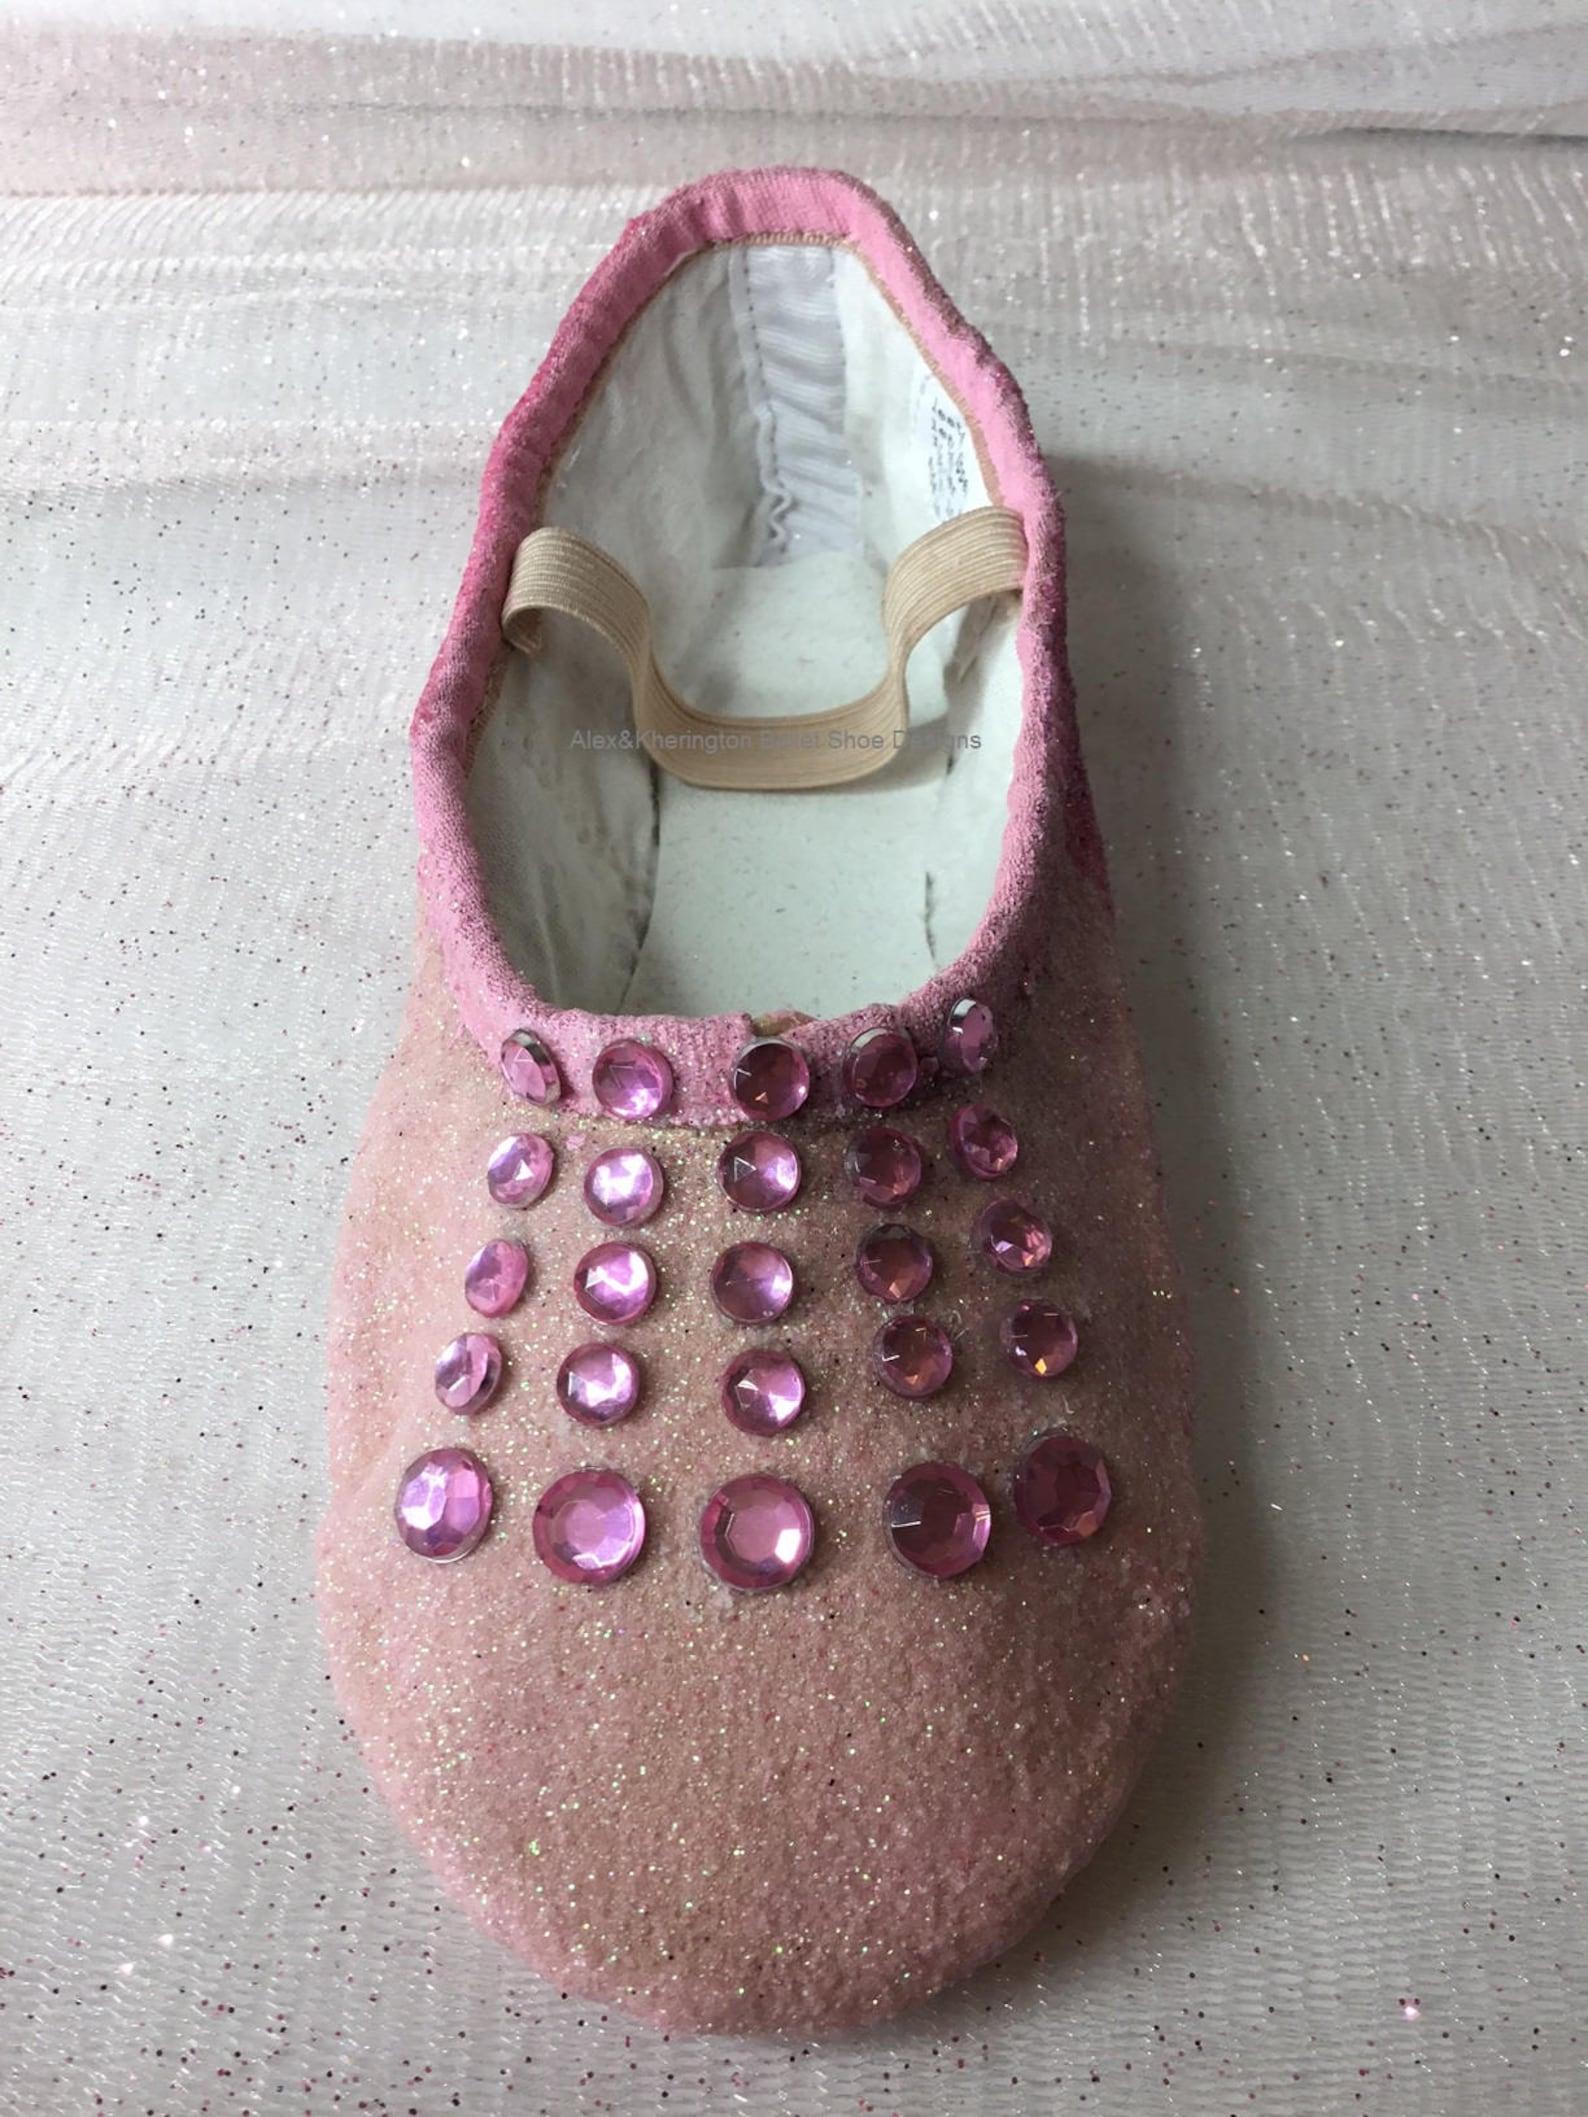 bella - alex & kherington ballet shoe designs (girl's), pair, ballet shoes, ballet shoe art, ballet flats, ballet slippers